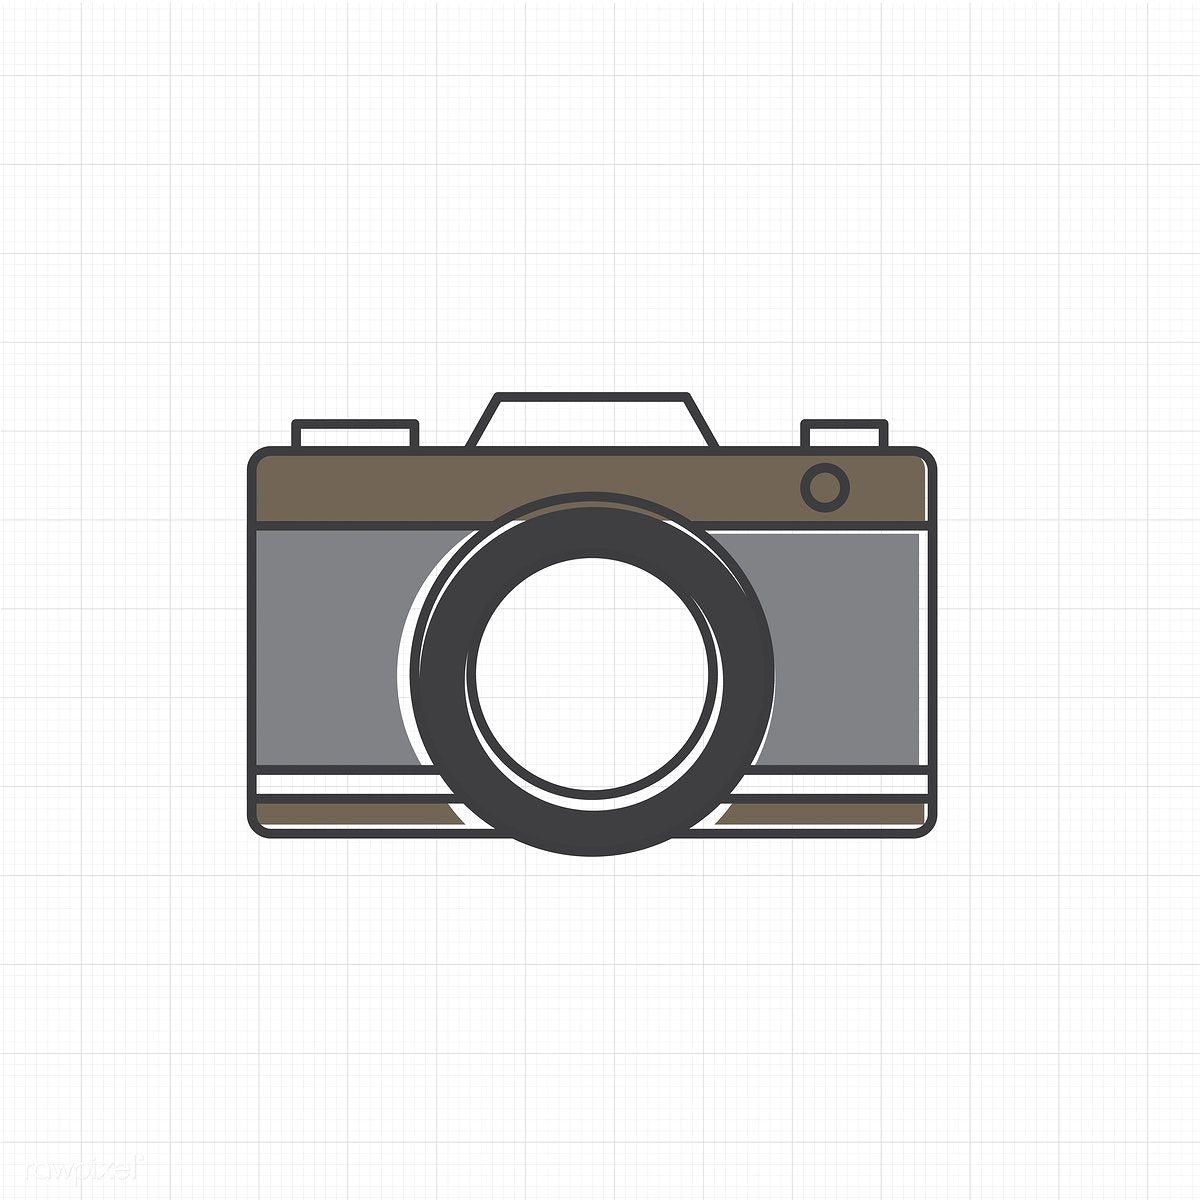 Vector Of Camera Icon Free Image By Rawpixel Com Camera Icon Camera Illustration Vintage Film Camera